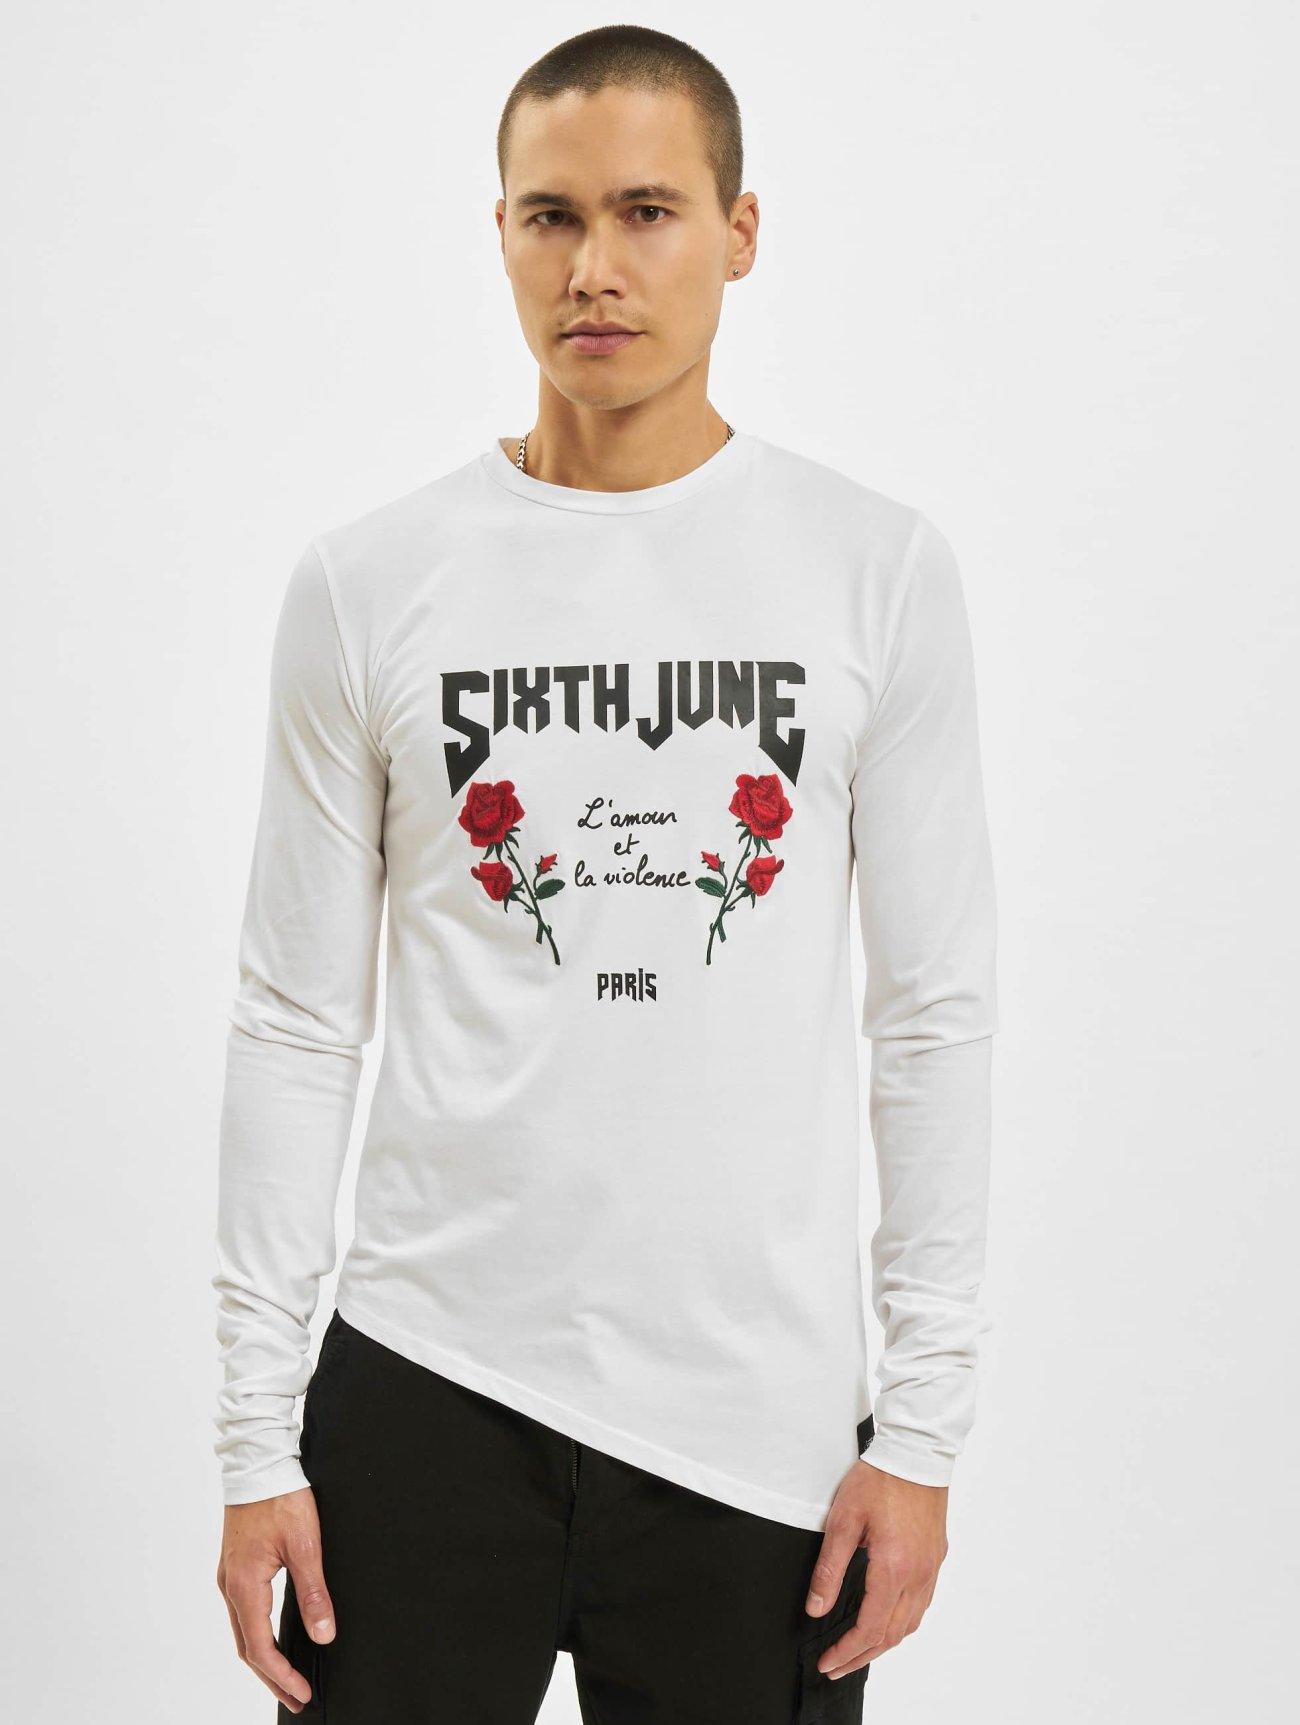 Sixth June | Tōhoku blanc Homme T-Shirt manches longues 518364| Homme Hauts